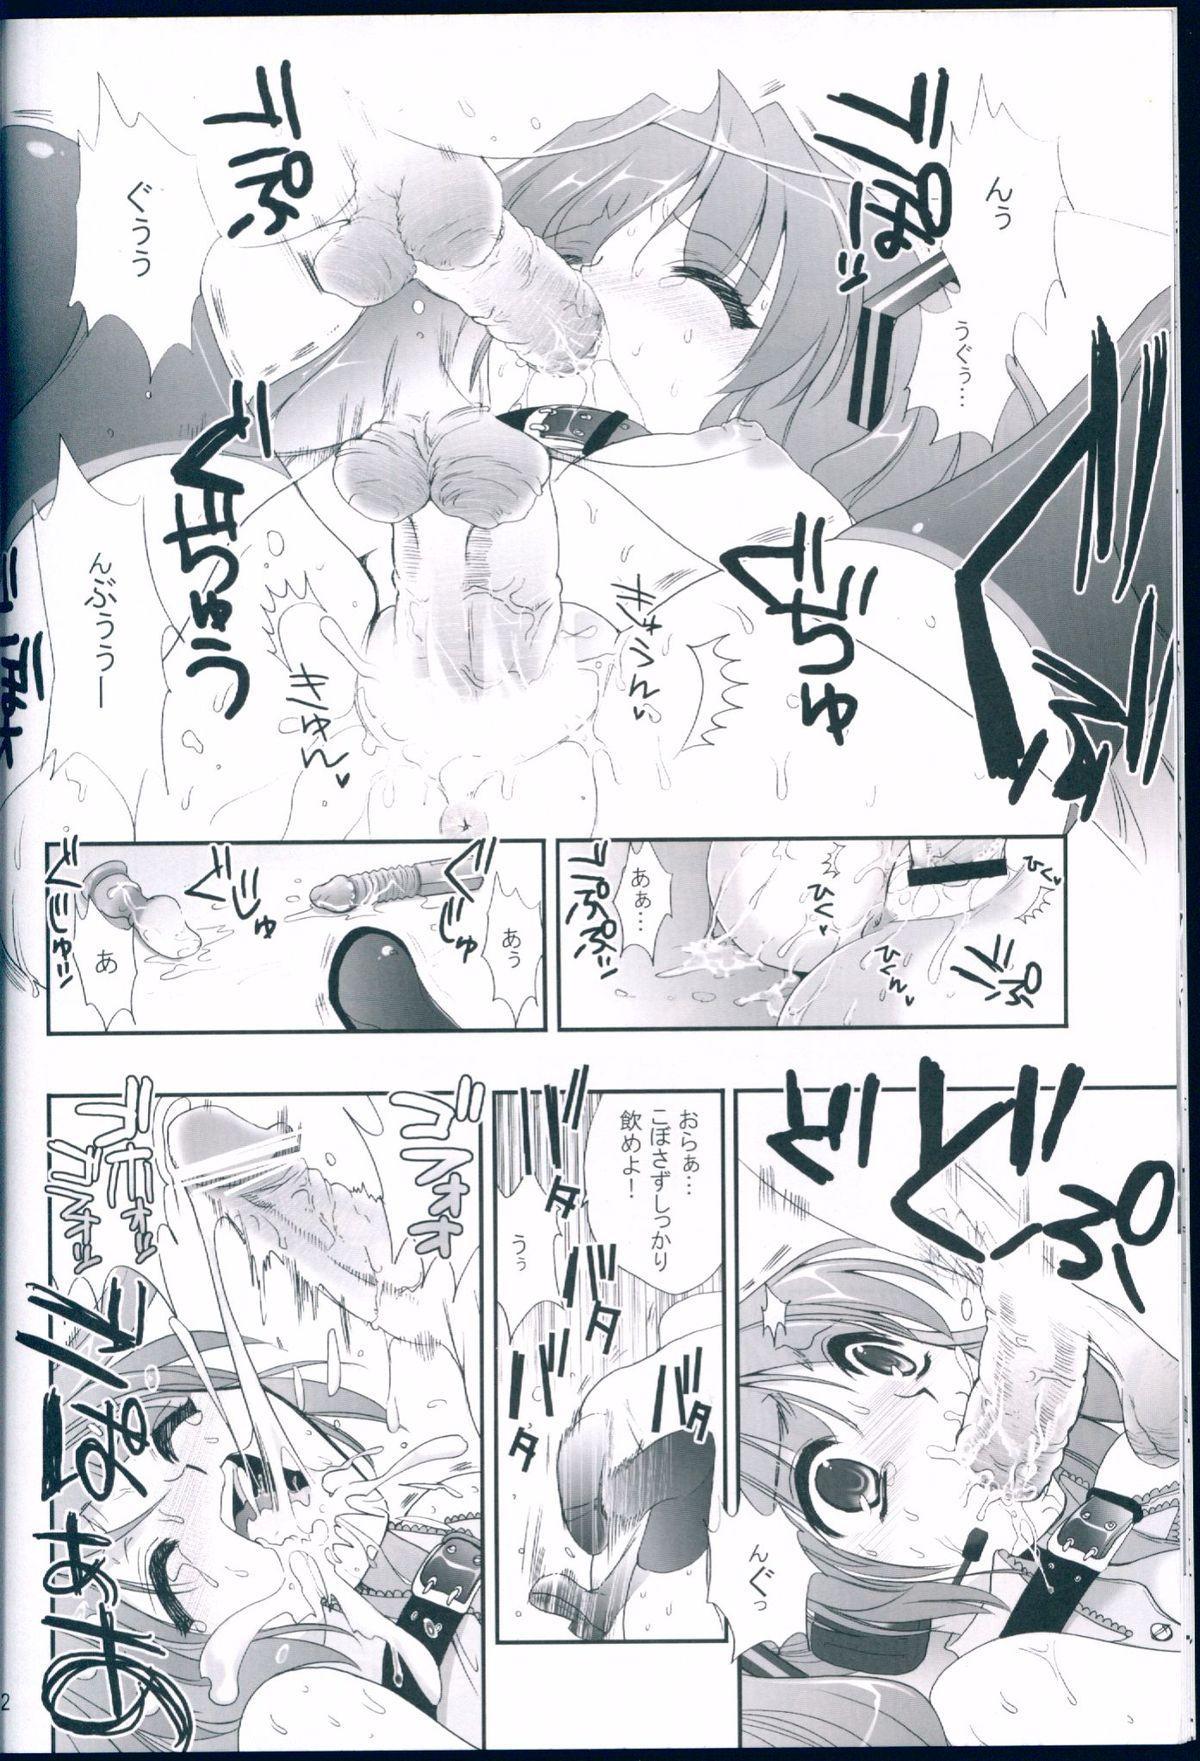 R Juu - Hatsune Miku Kenkan 11